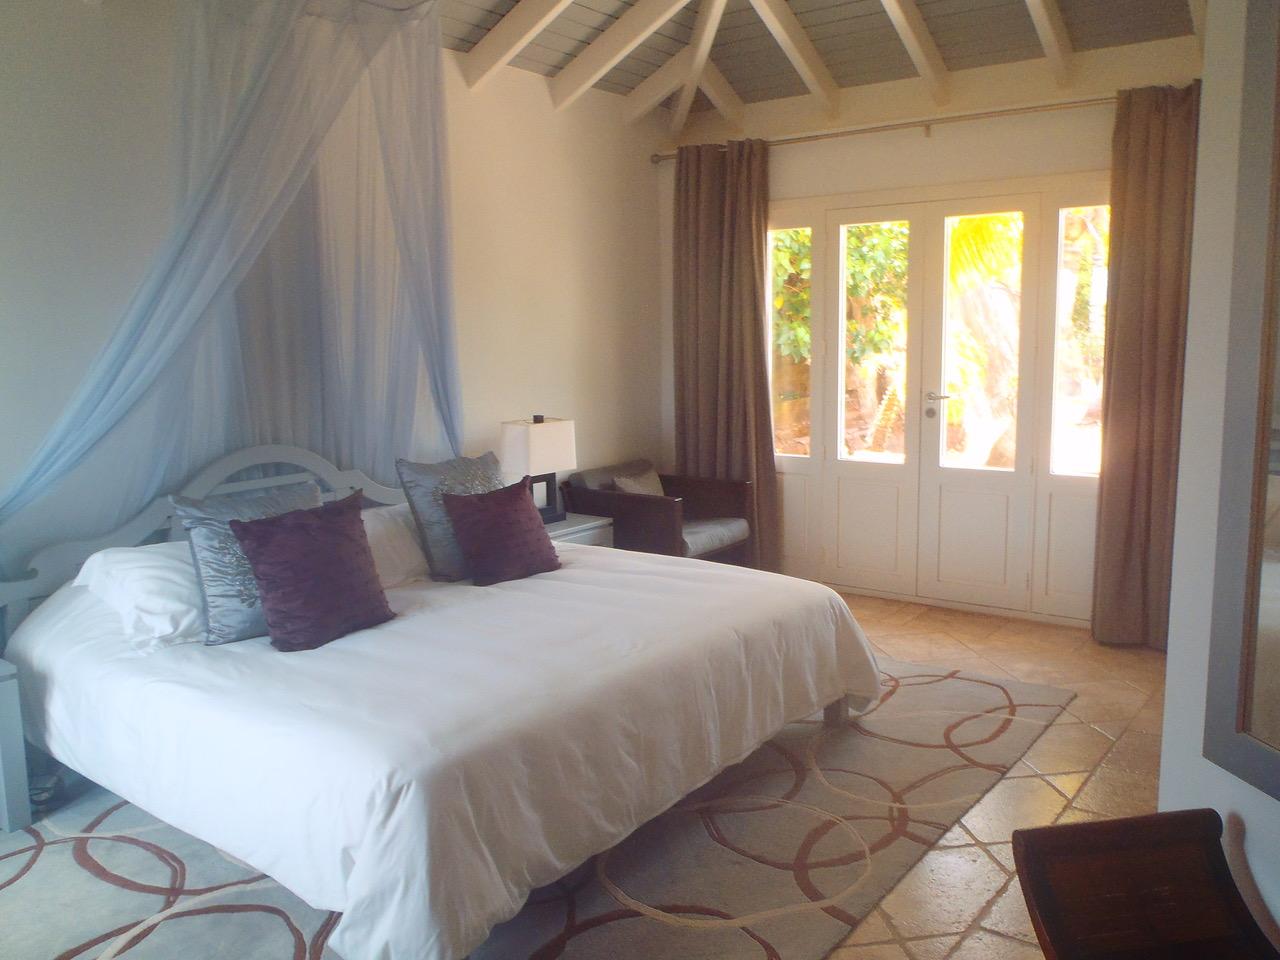 Villa Zen - Seaview Villa for Rent With Jacuzzi and Pool - Bedroom